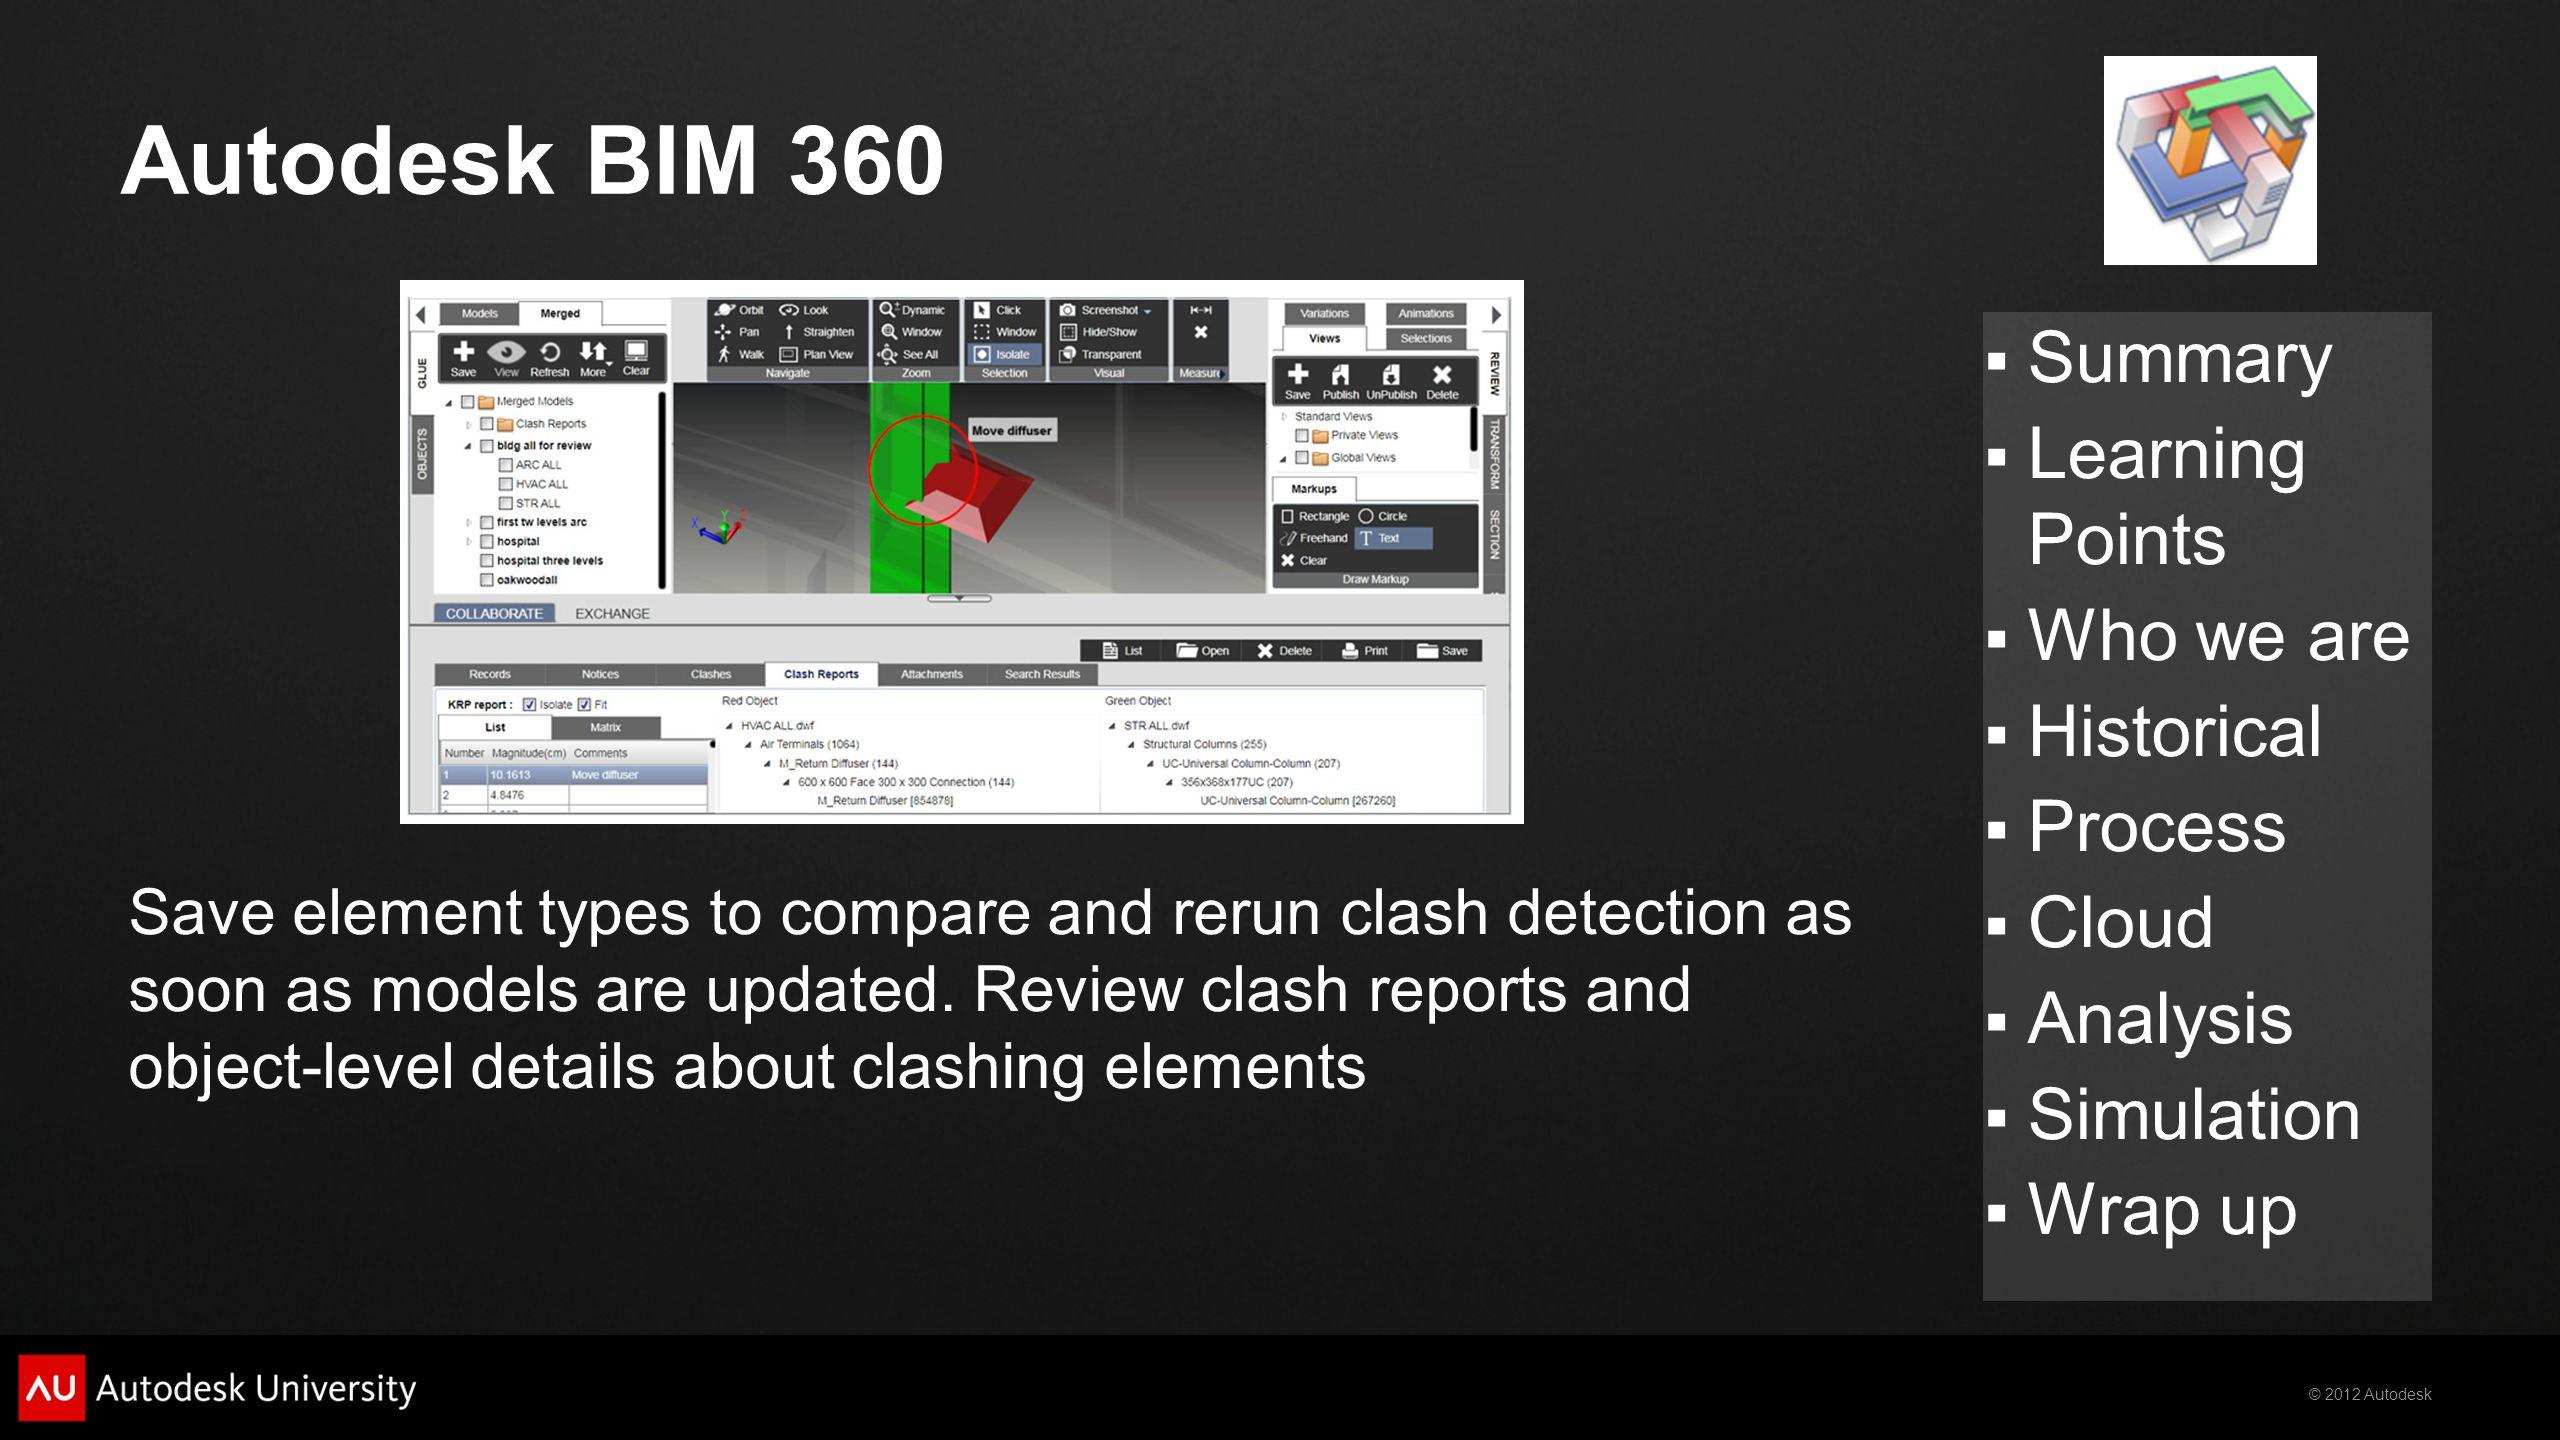 © 2012 Autodesk  Summary  Learning Points  Who we are  Historical  Process  Cloud  Analysis  Simulation  Wrap up Autodesk BIM 360 Save elemen